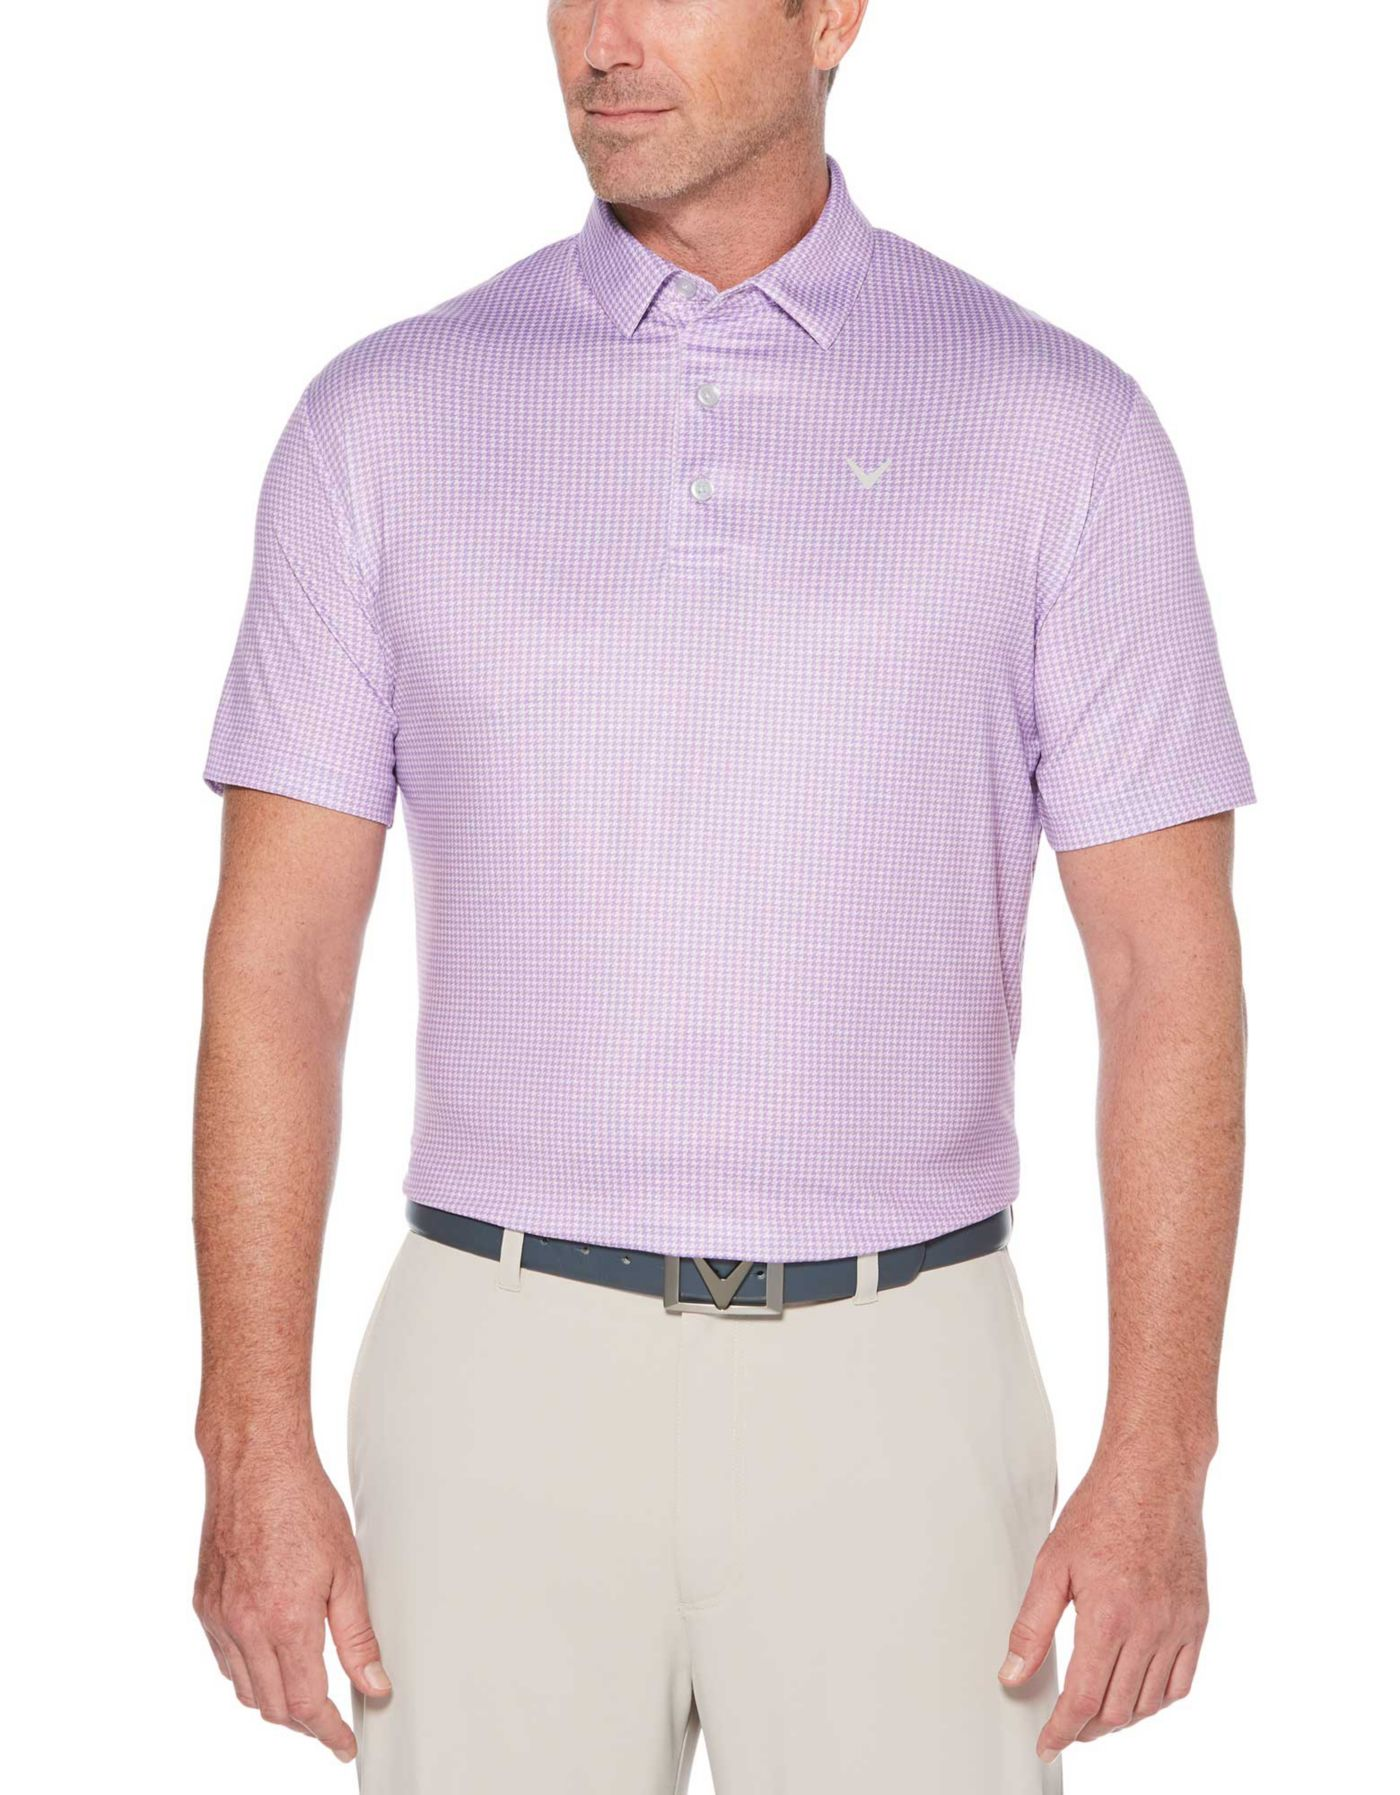 Callaway Men's Houndstooth Printed Golf Polo